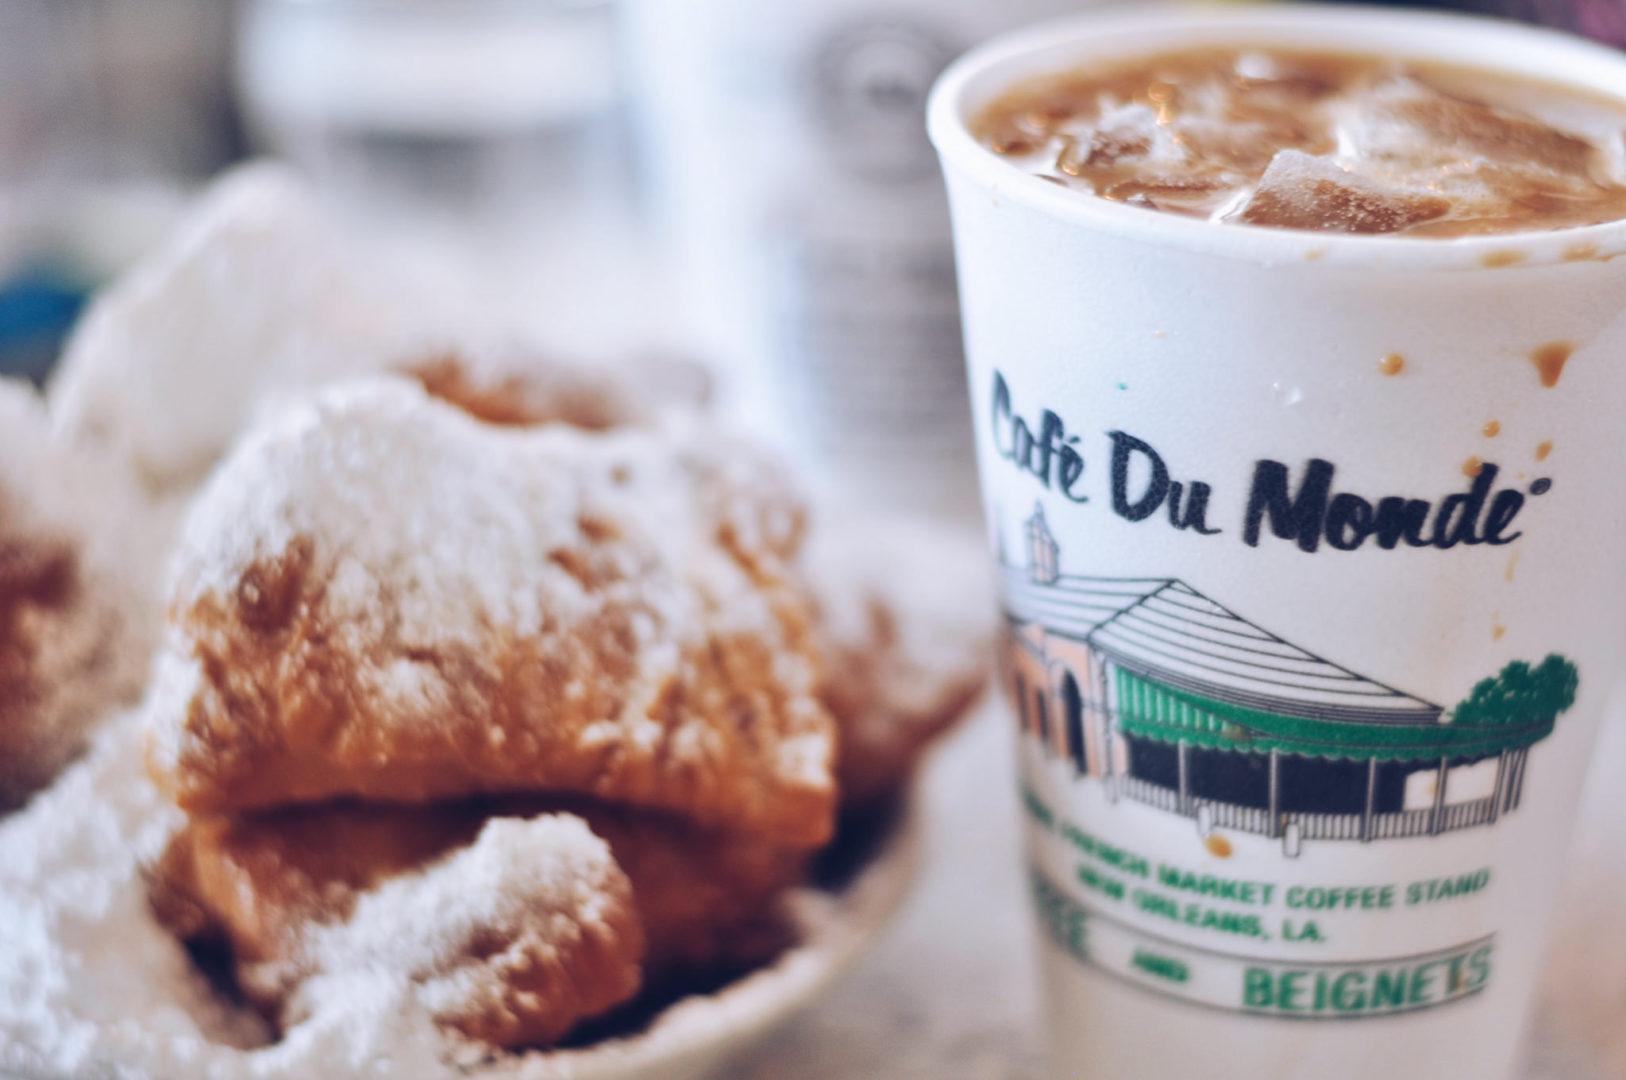 Beignets from Café du Monde are a New Orleans favorite